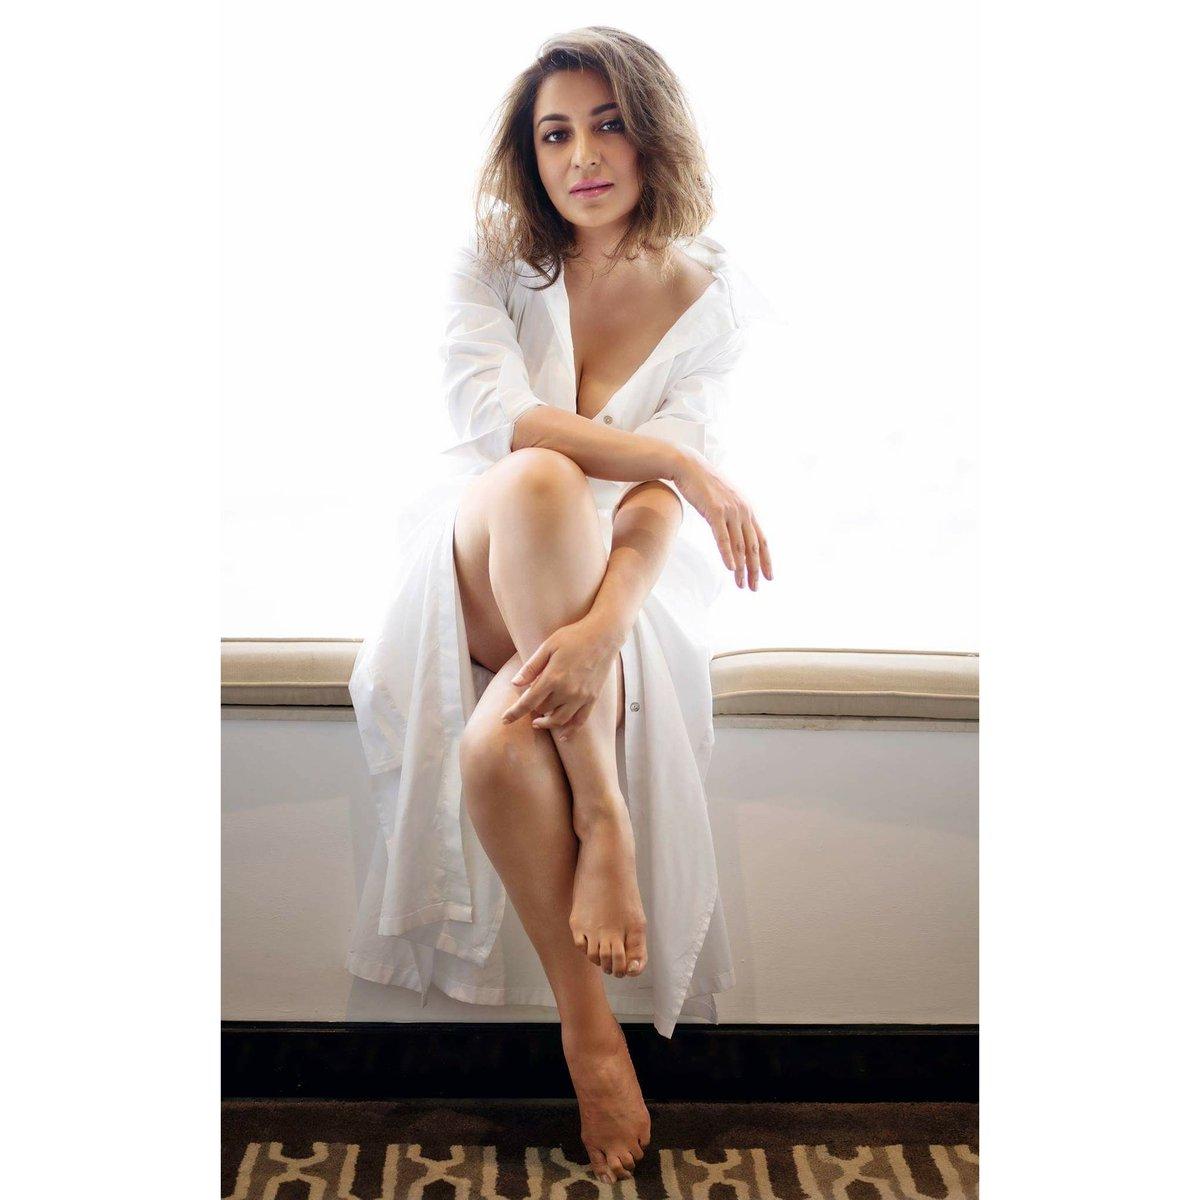 Image result for Tisca chopra Maxim India magazine's December issue.